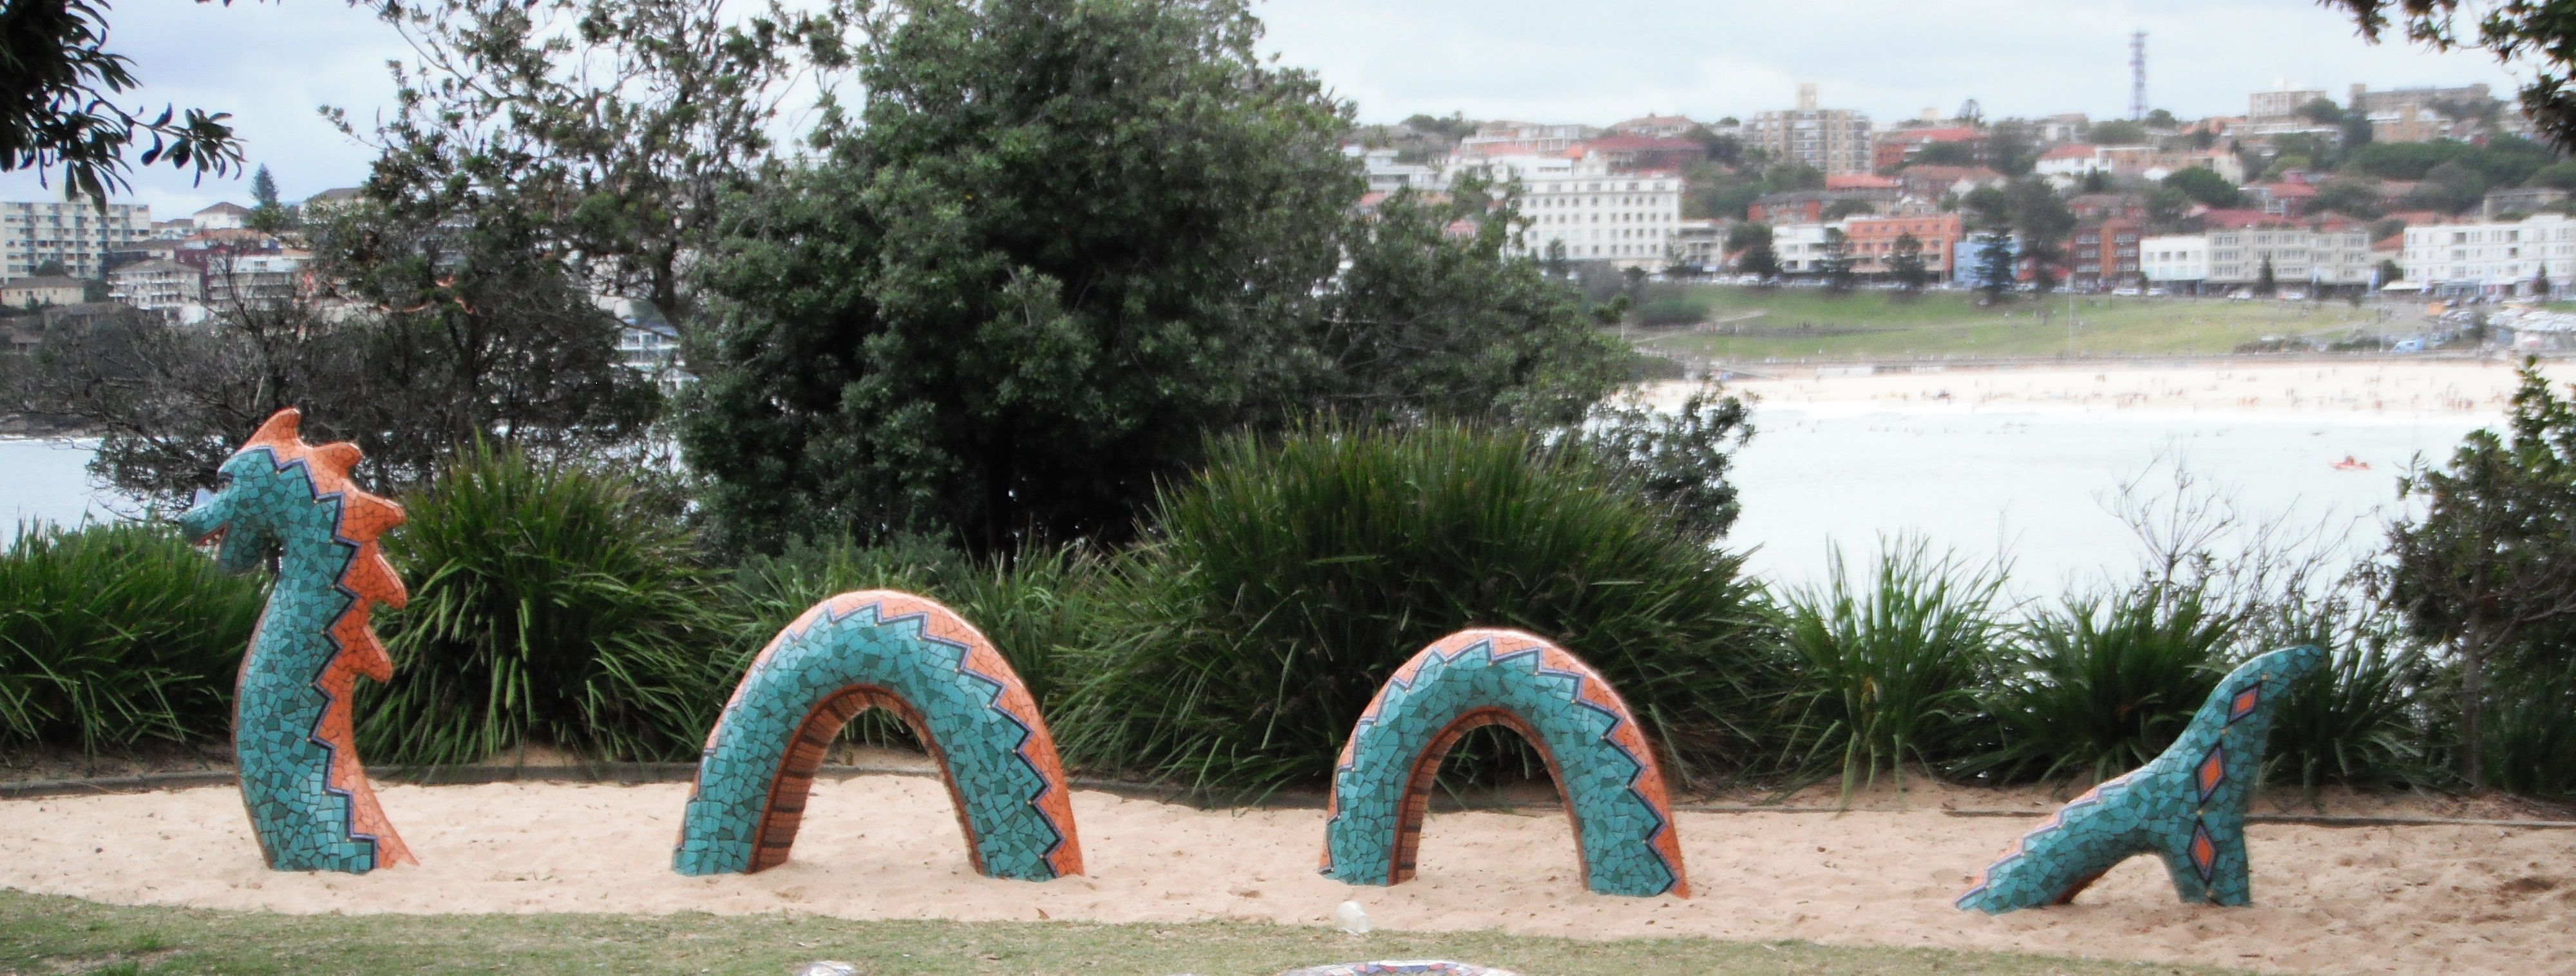 mosaic walls with found objects   Biddigal Reserve, North Bondi - Sydney